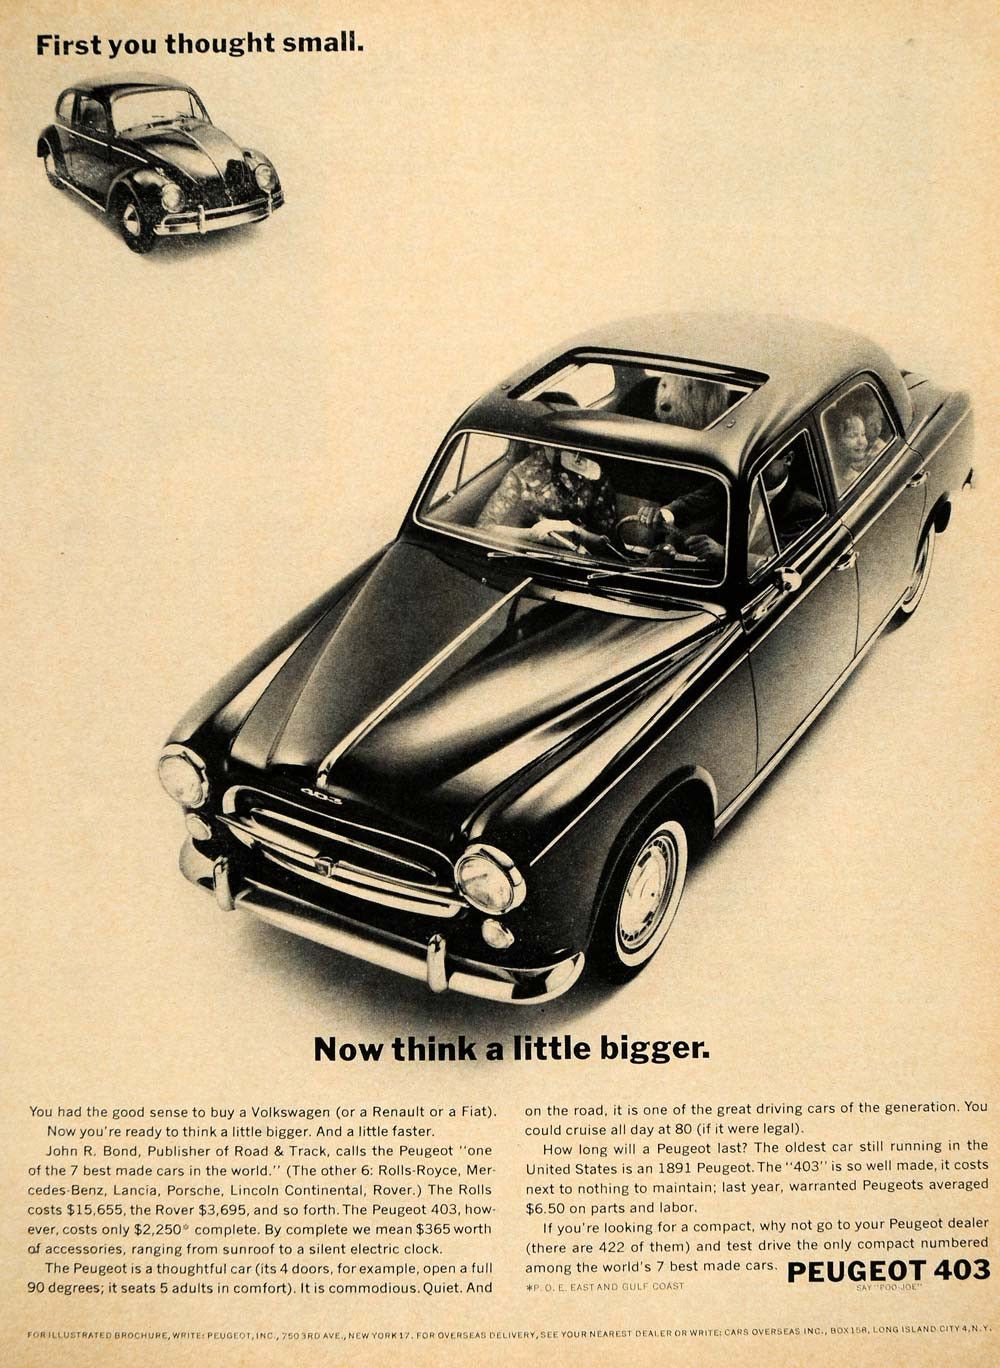 1961 Ad Peugeot 403 Best Car Road & Track John R Bond - ORIGINAL ...